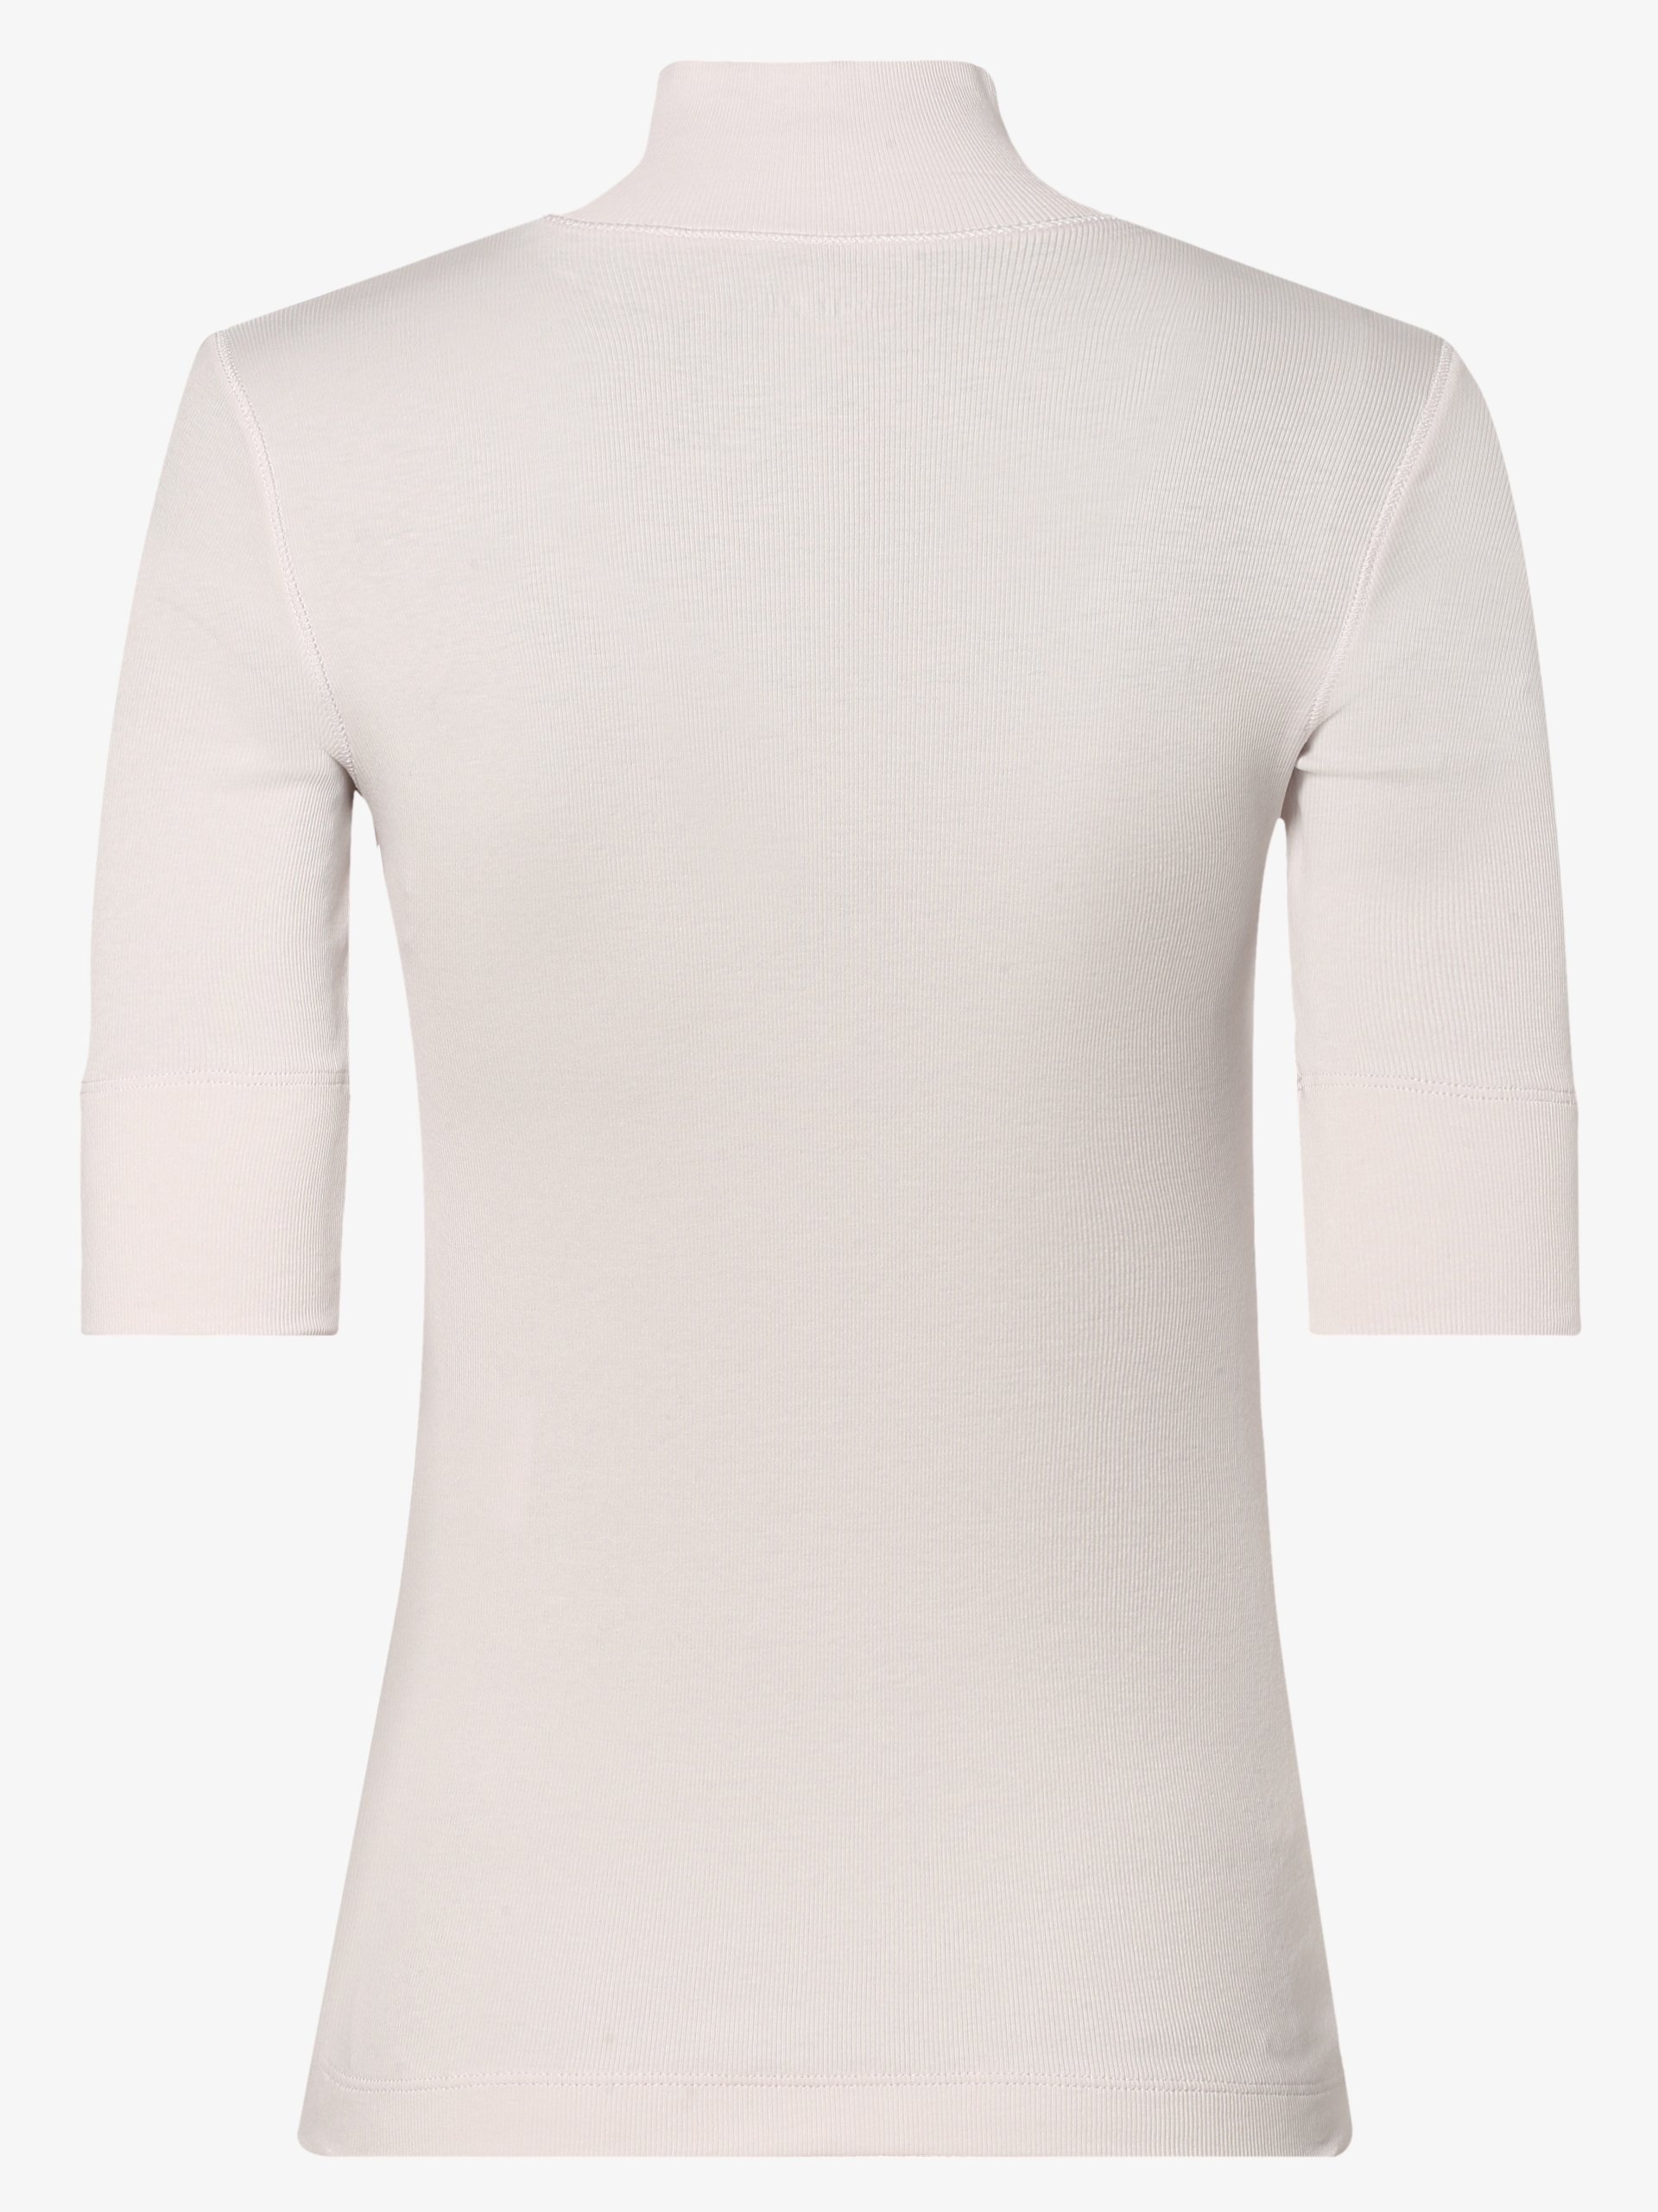 Marc Cain Sports Koszulka damska